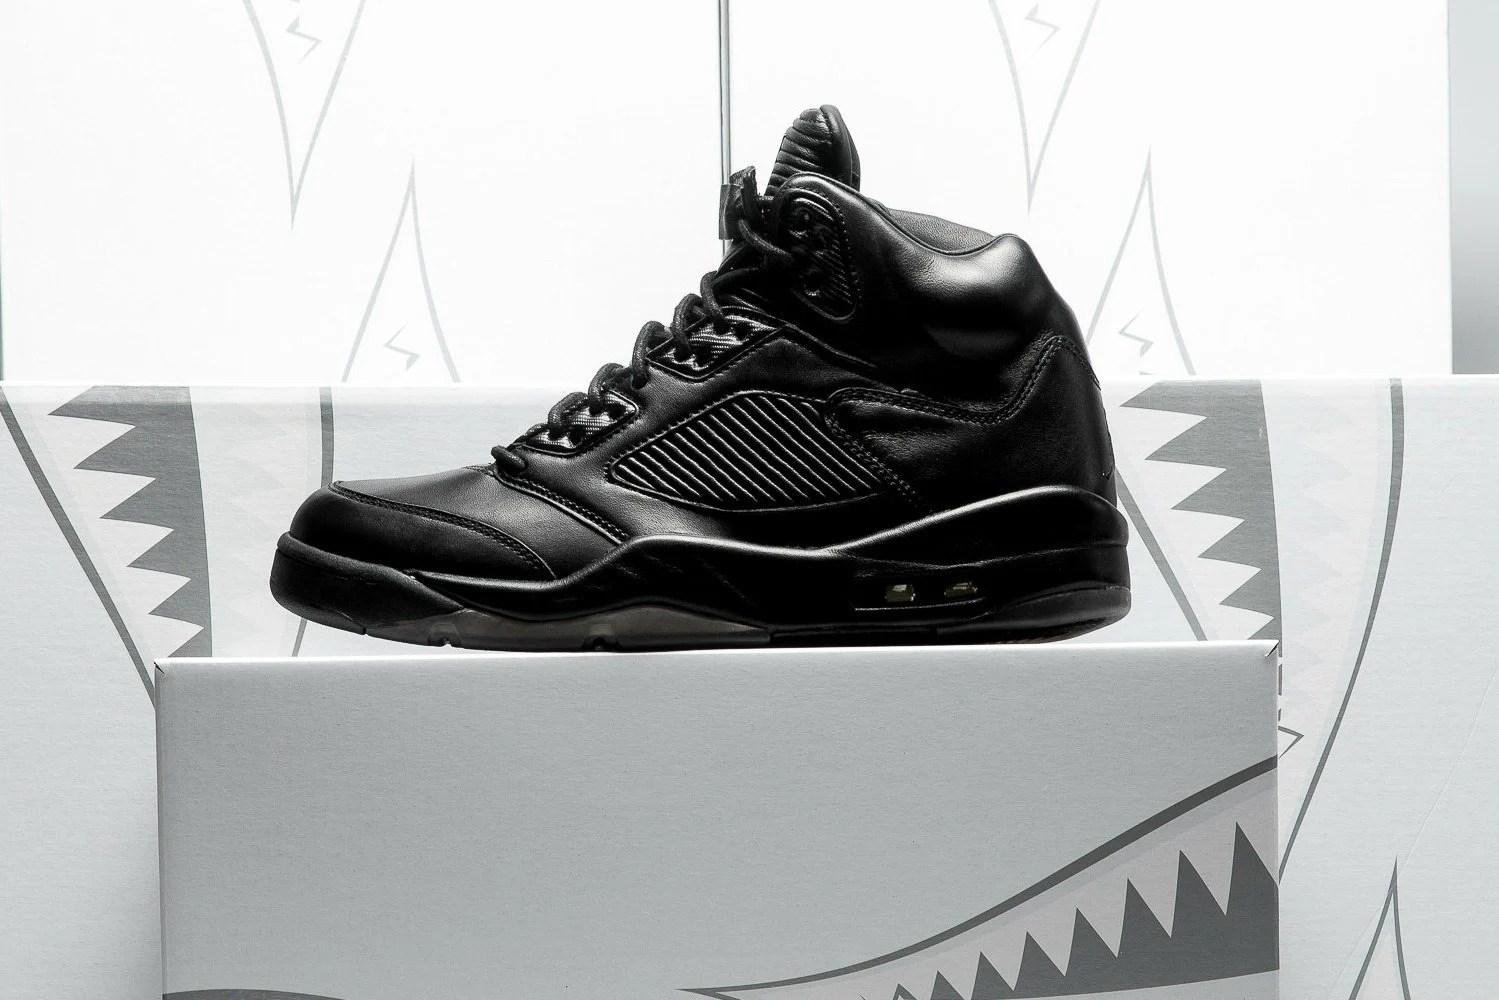 2015 New Arrive Nike Jordan 4 Cheap sale All Black